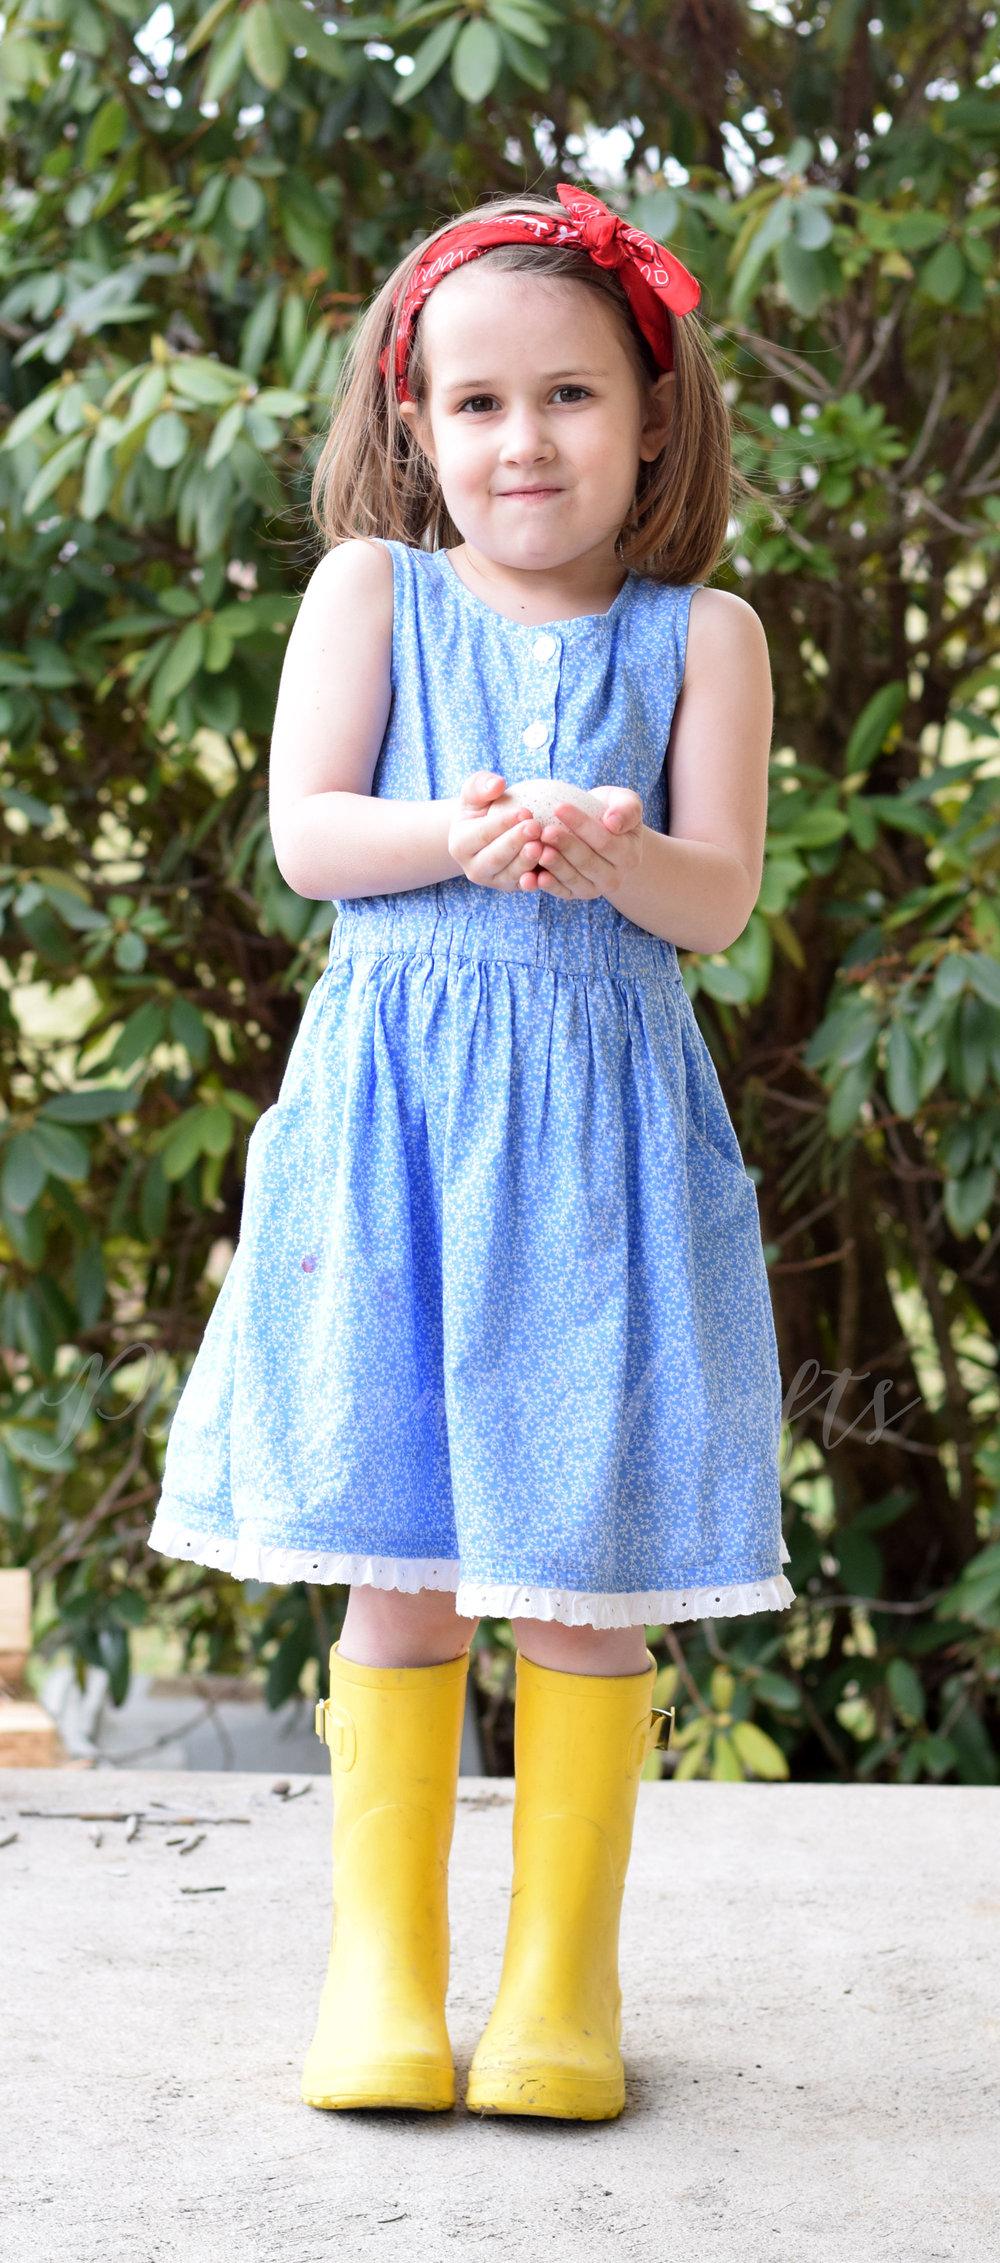 Seed Dress from Project Farmer's Market